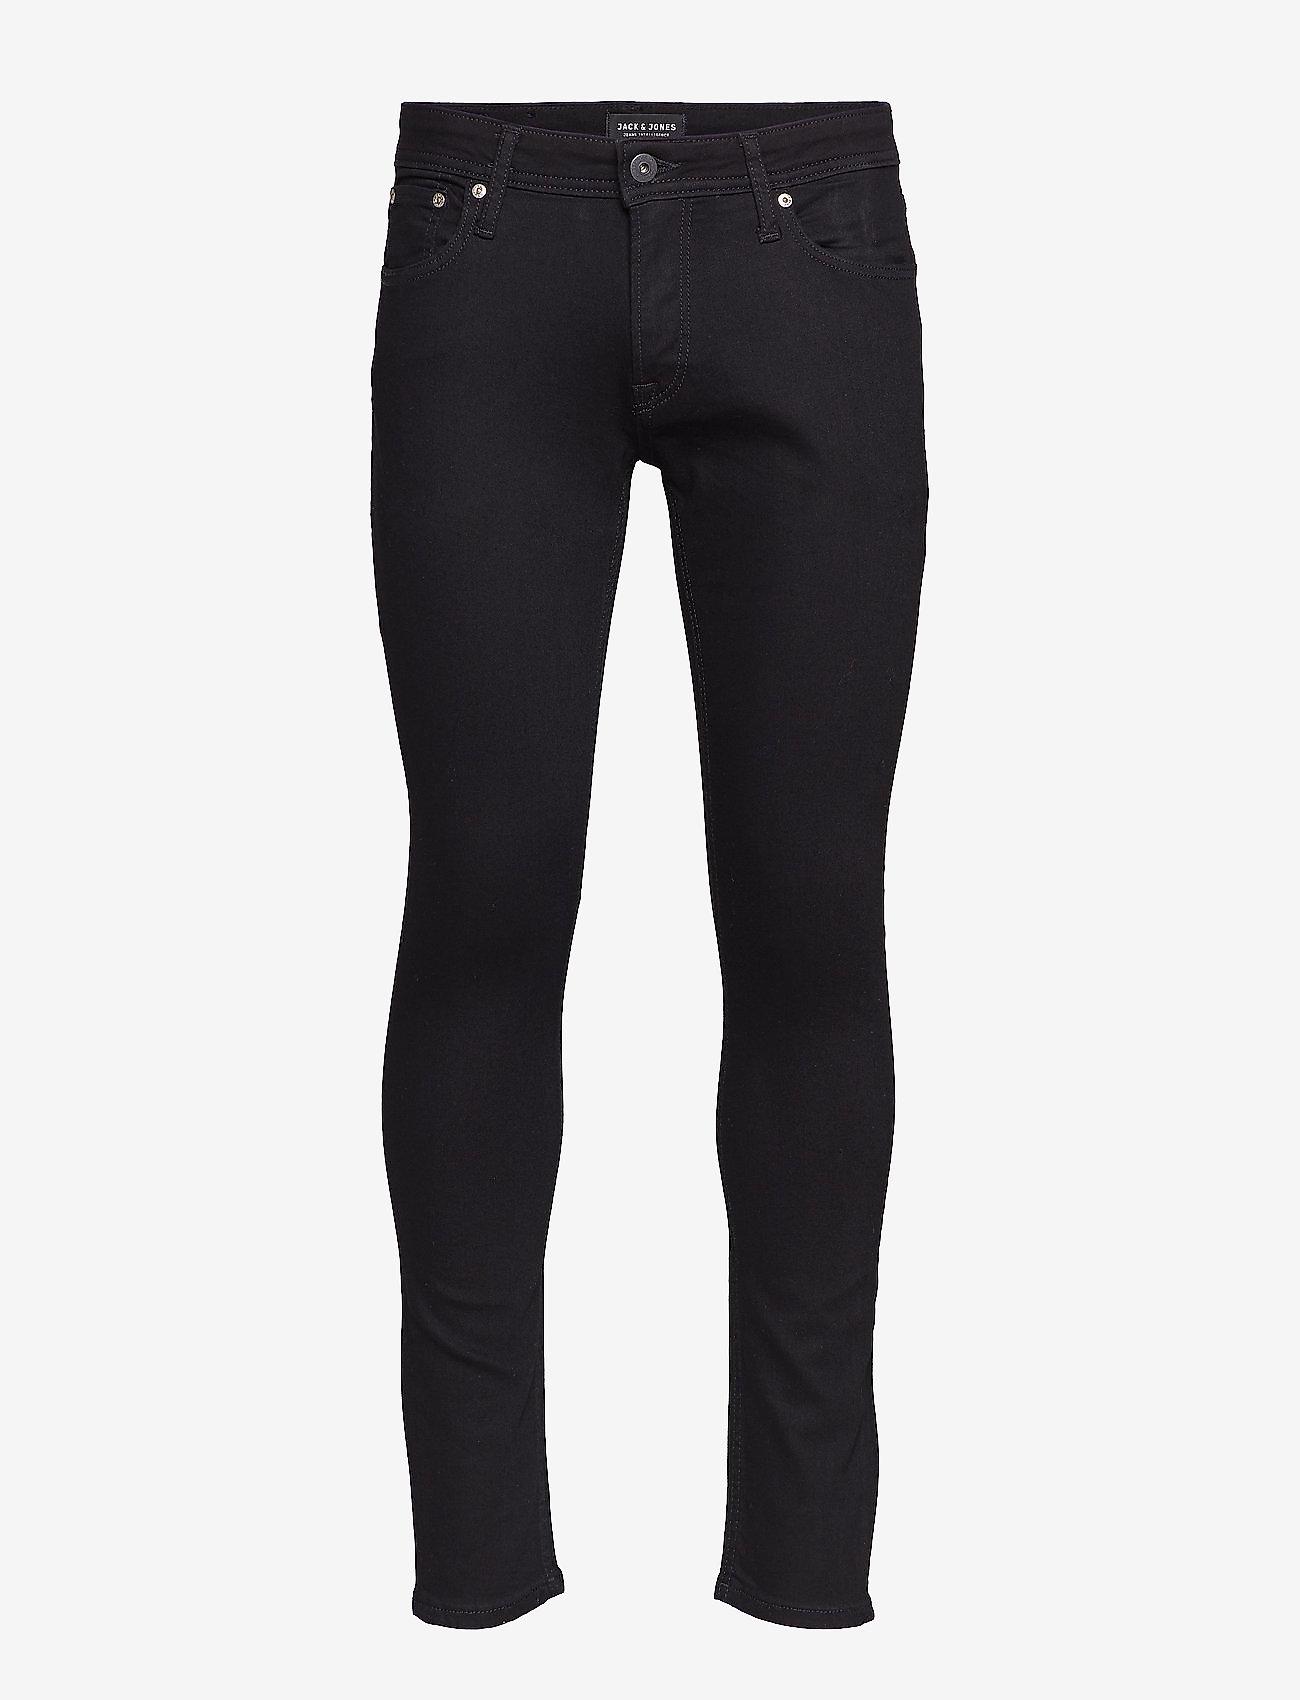 Jack & Jones - JJILIAM JJORIGINAL AM 009 50 SPS - skinny jeans - black denim - 0